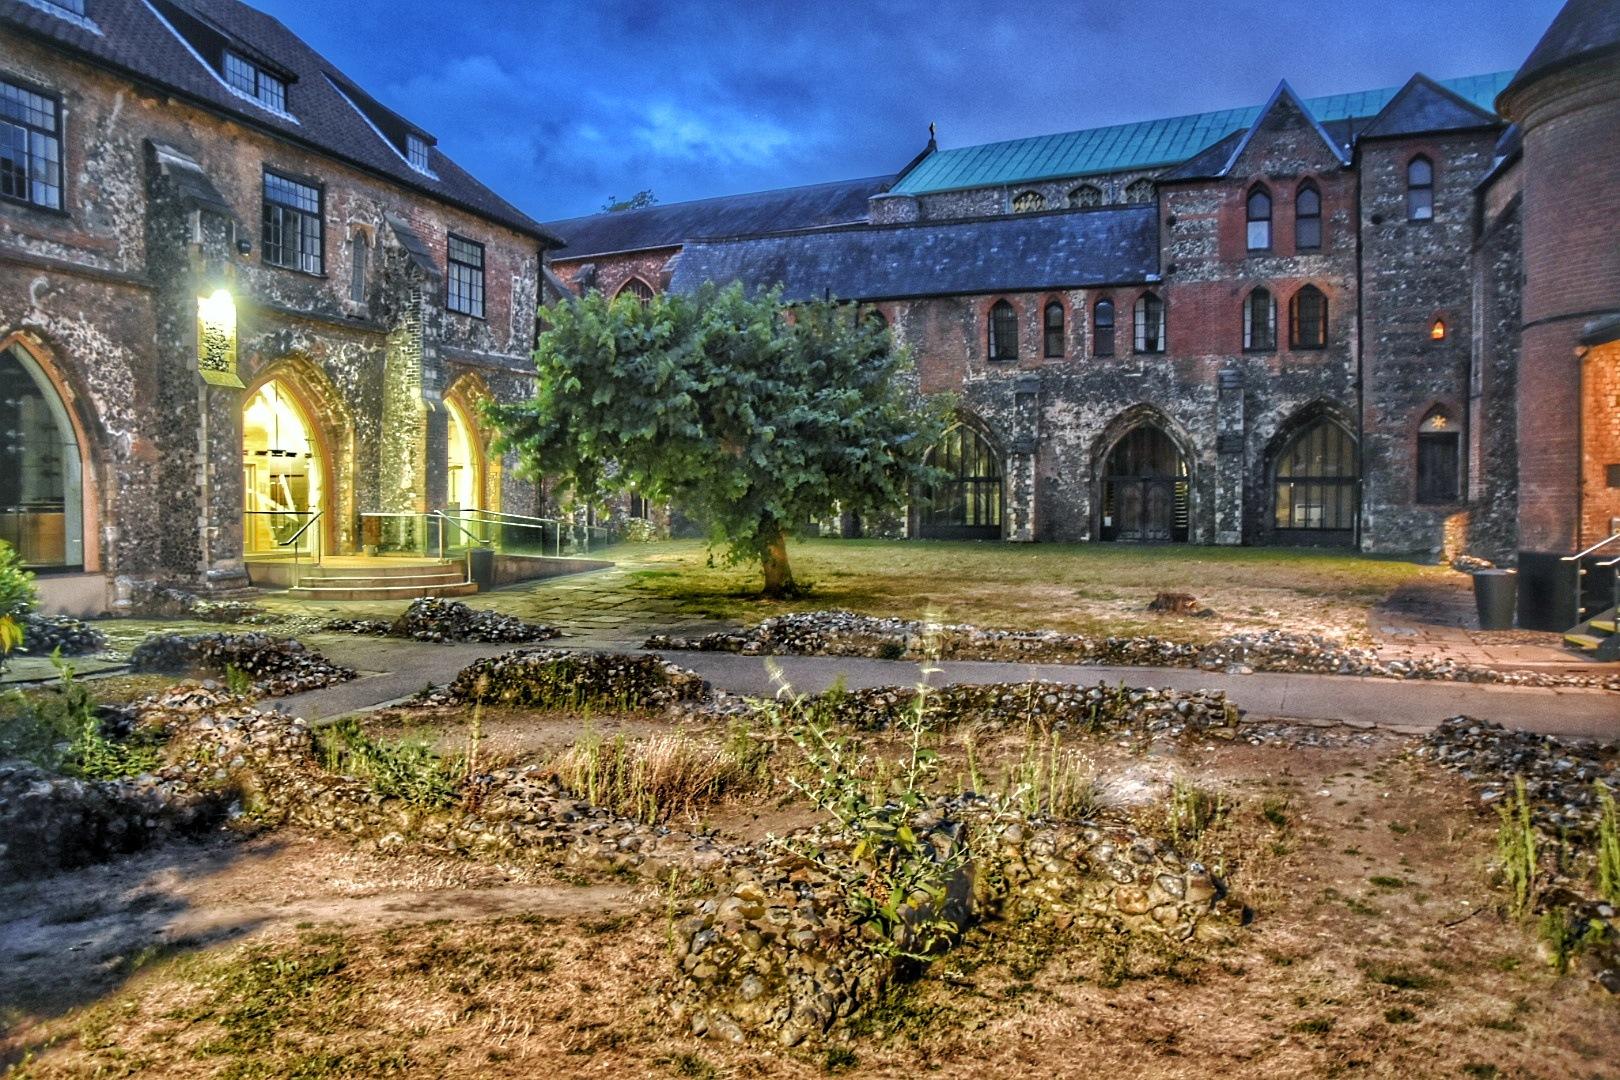 Medieval Norwich by David Starkey